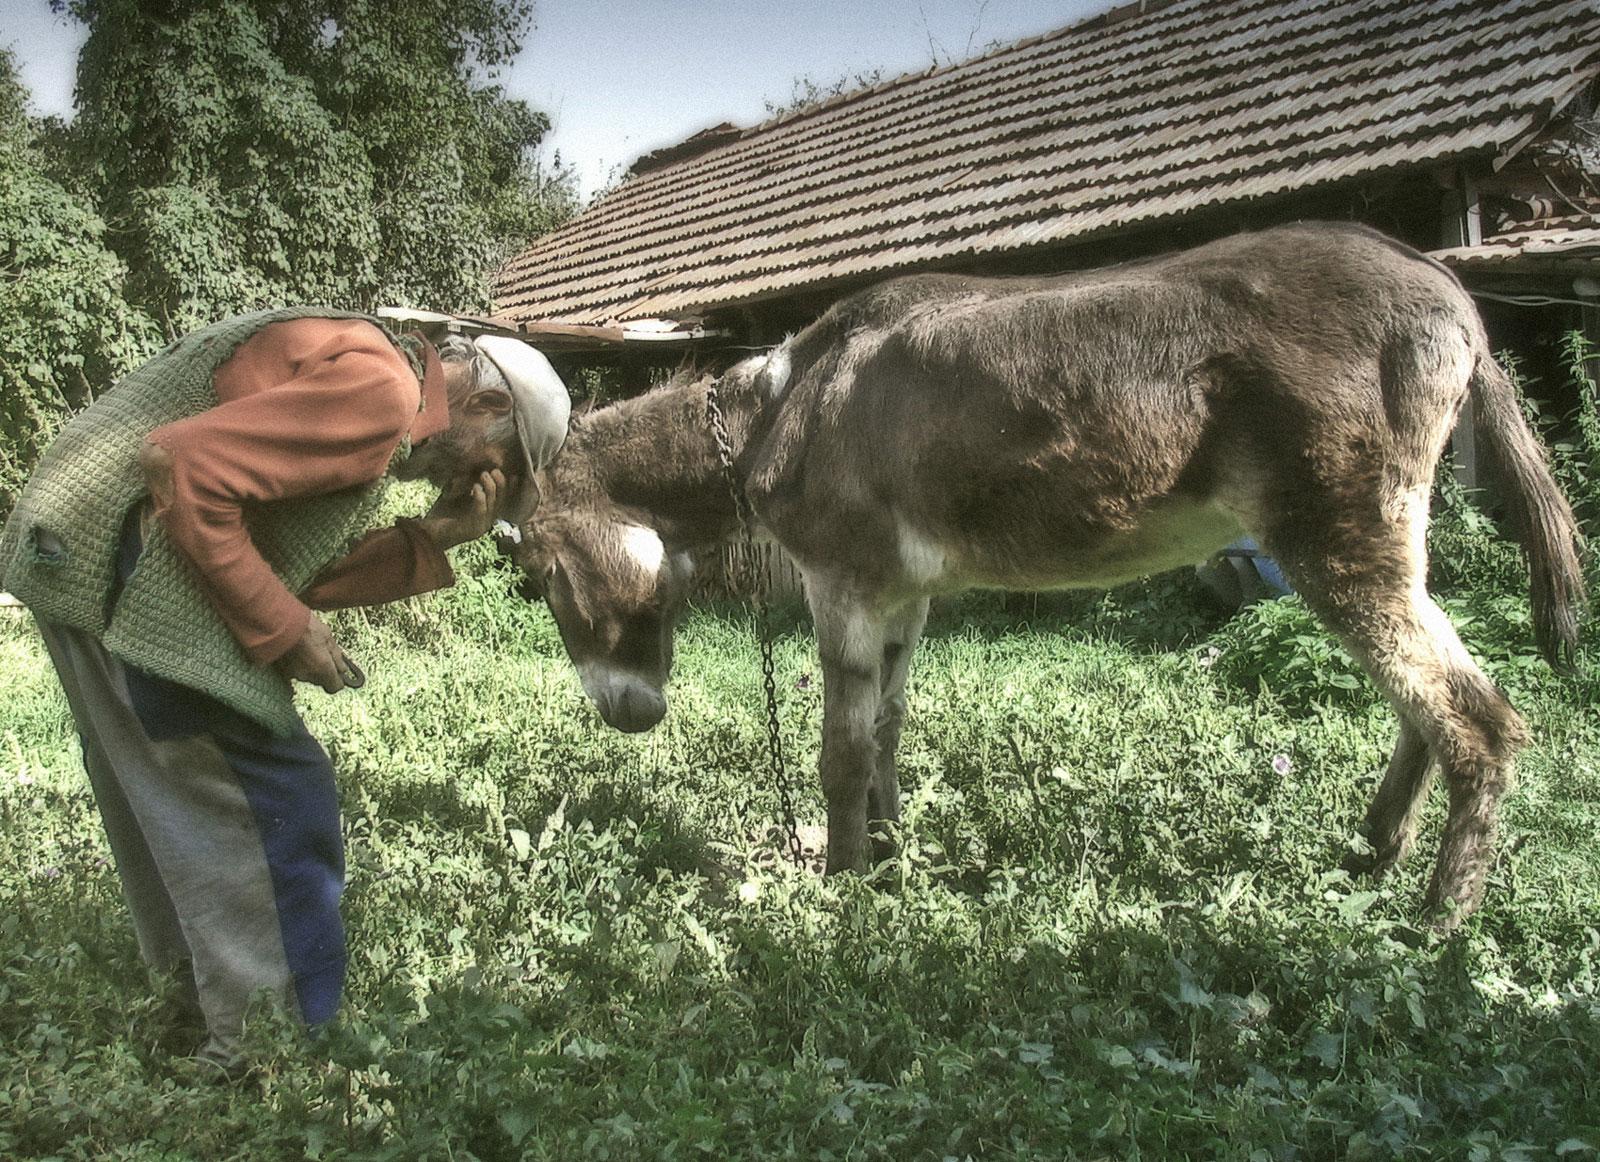 Only You, Animal, Bspo06, Donkey, Farm, HQ Photo